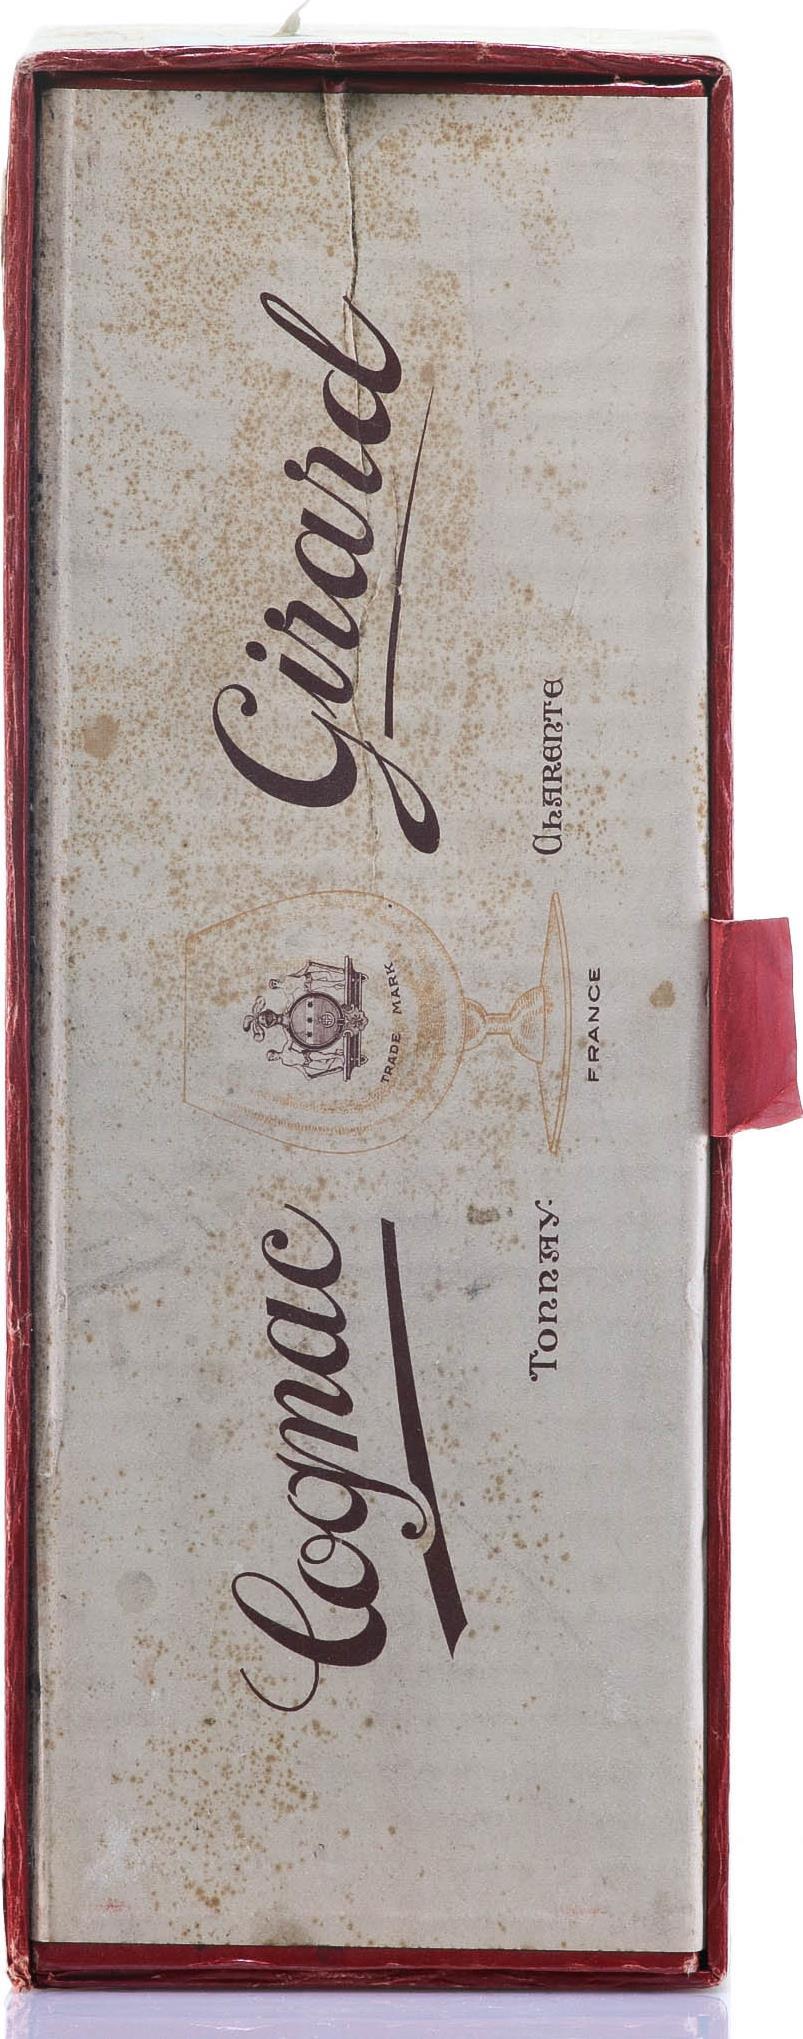 Cognac 1896 Girard